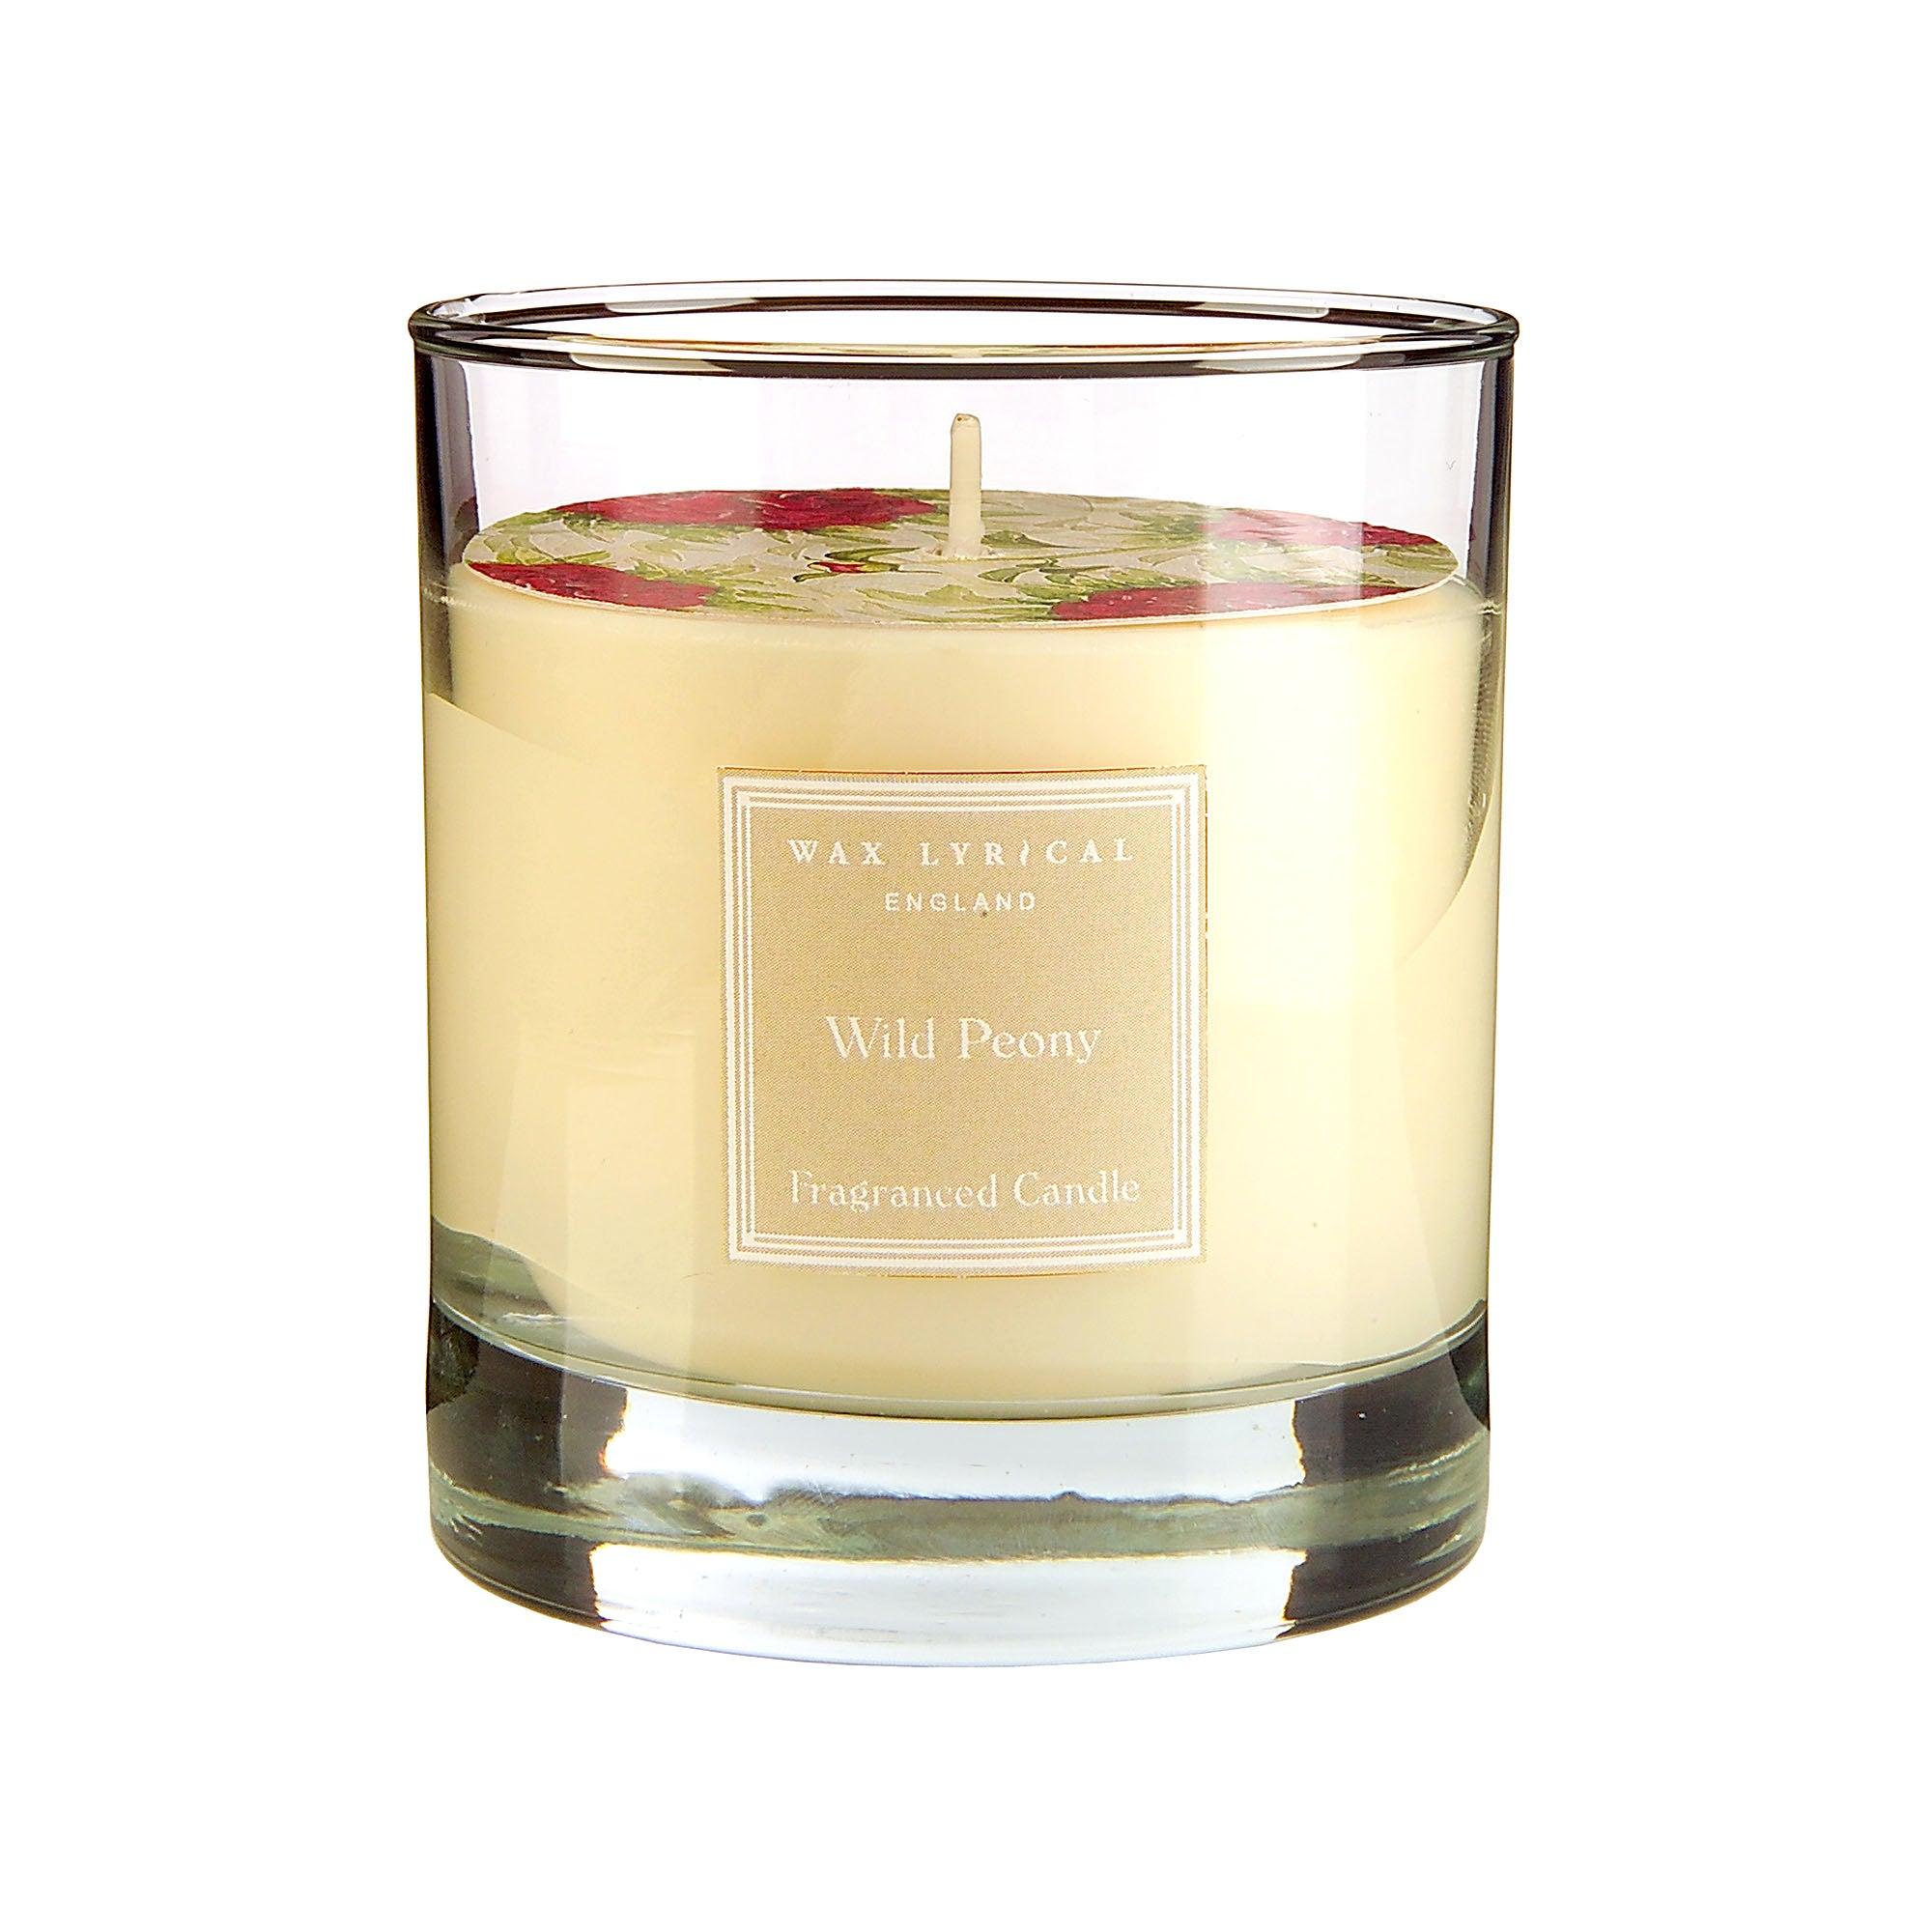 Wax Lyrical Wild Peony Glass Candle